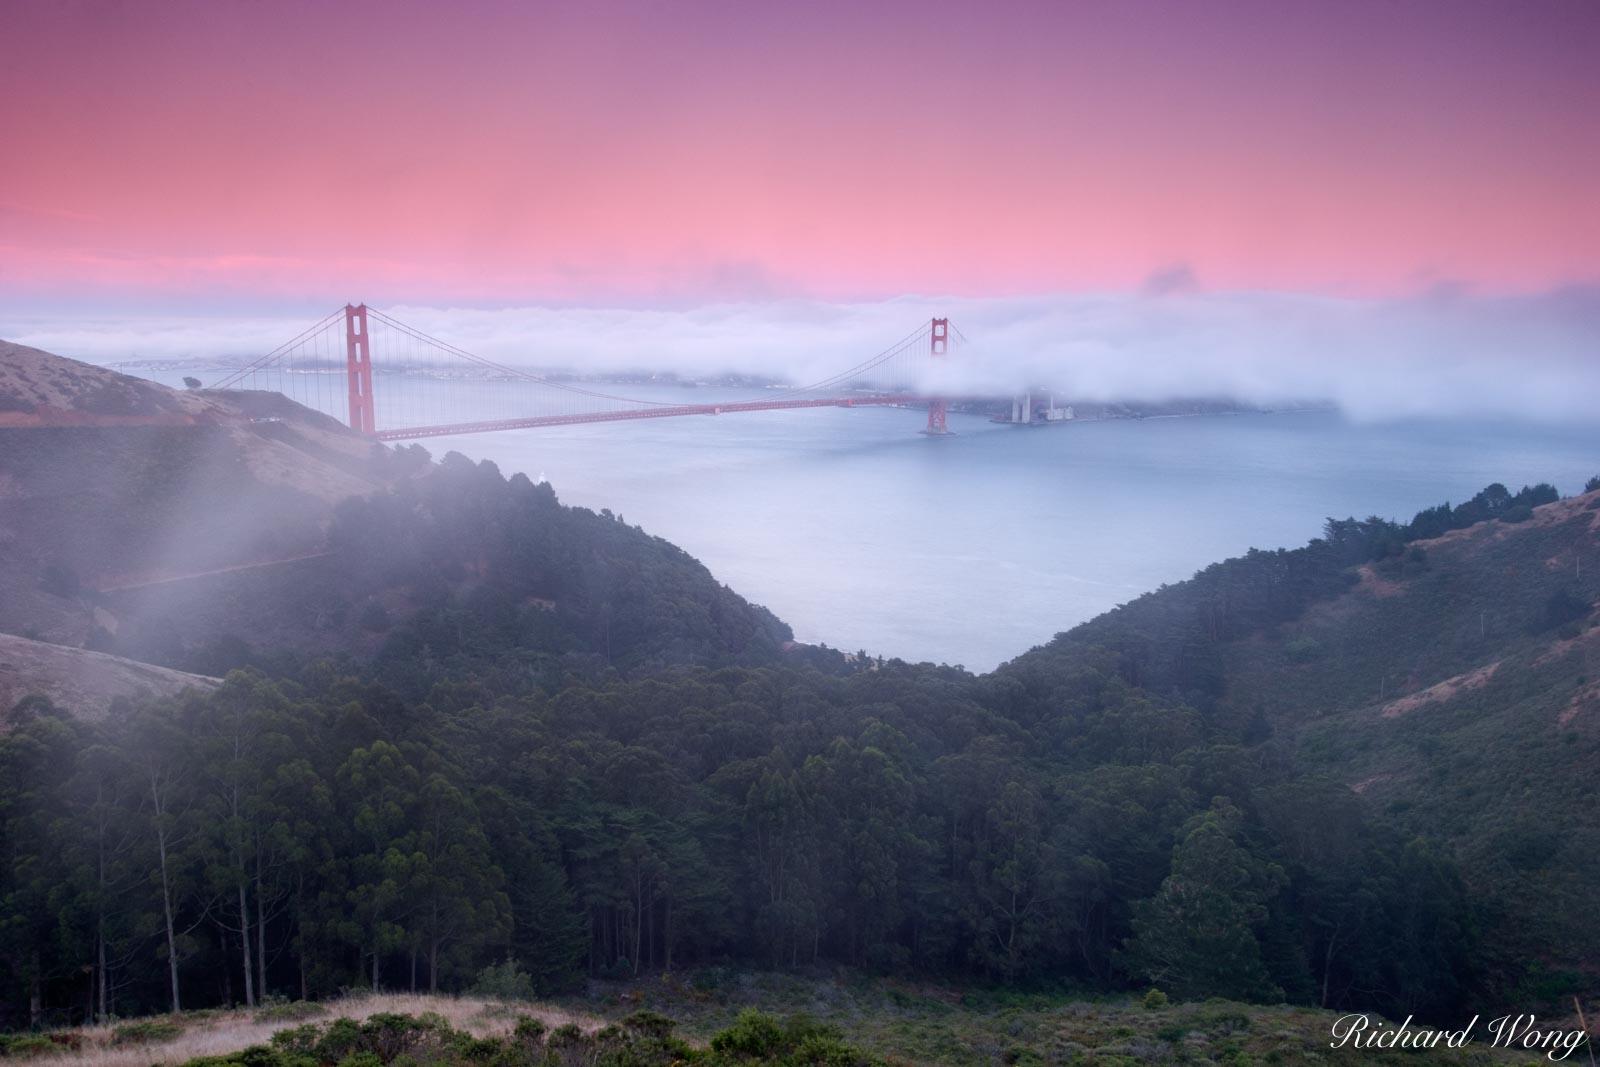 California, bridges, cloud, coast, dusk, foggy, golden gate bridge, iconic landmarks, landmark, landscapes, low clouds, marin headlands, mountain, mountains, san francisco, scenery, scenic landscape, , photo